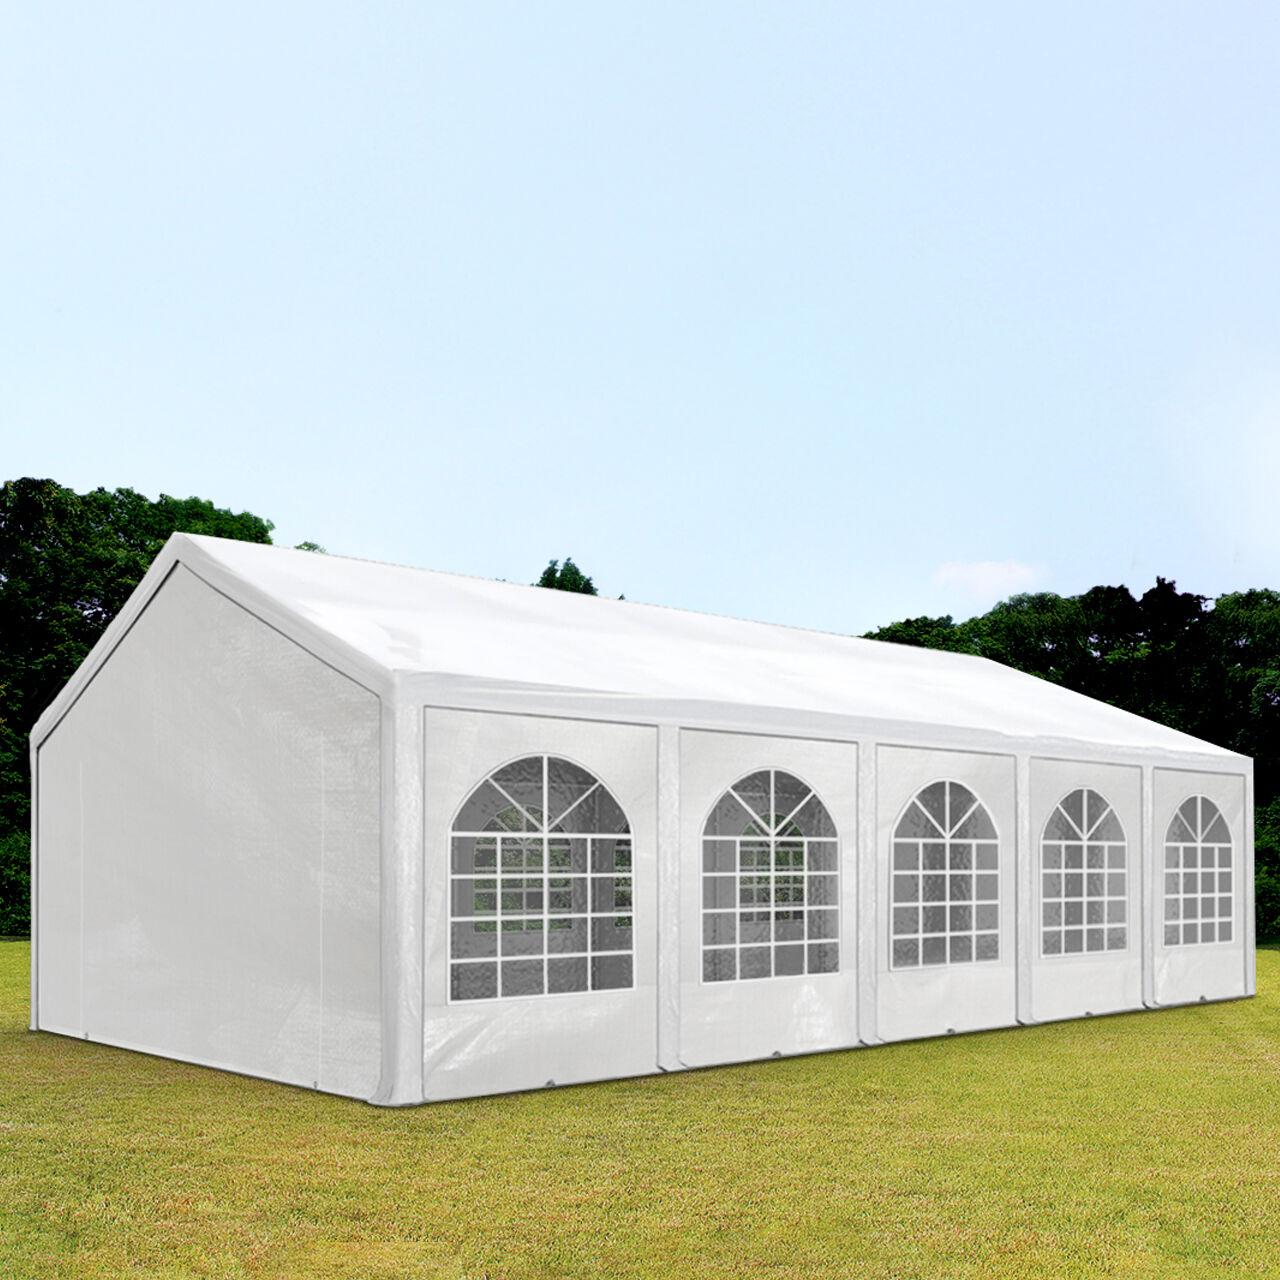 Toolport Tendone per Feste 4x10m PE 240g/m² bianco impermeabile